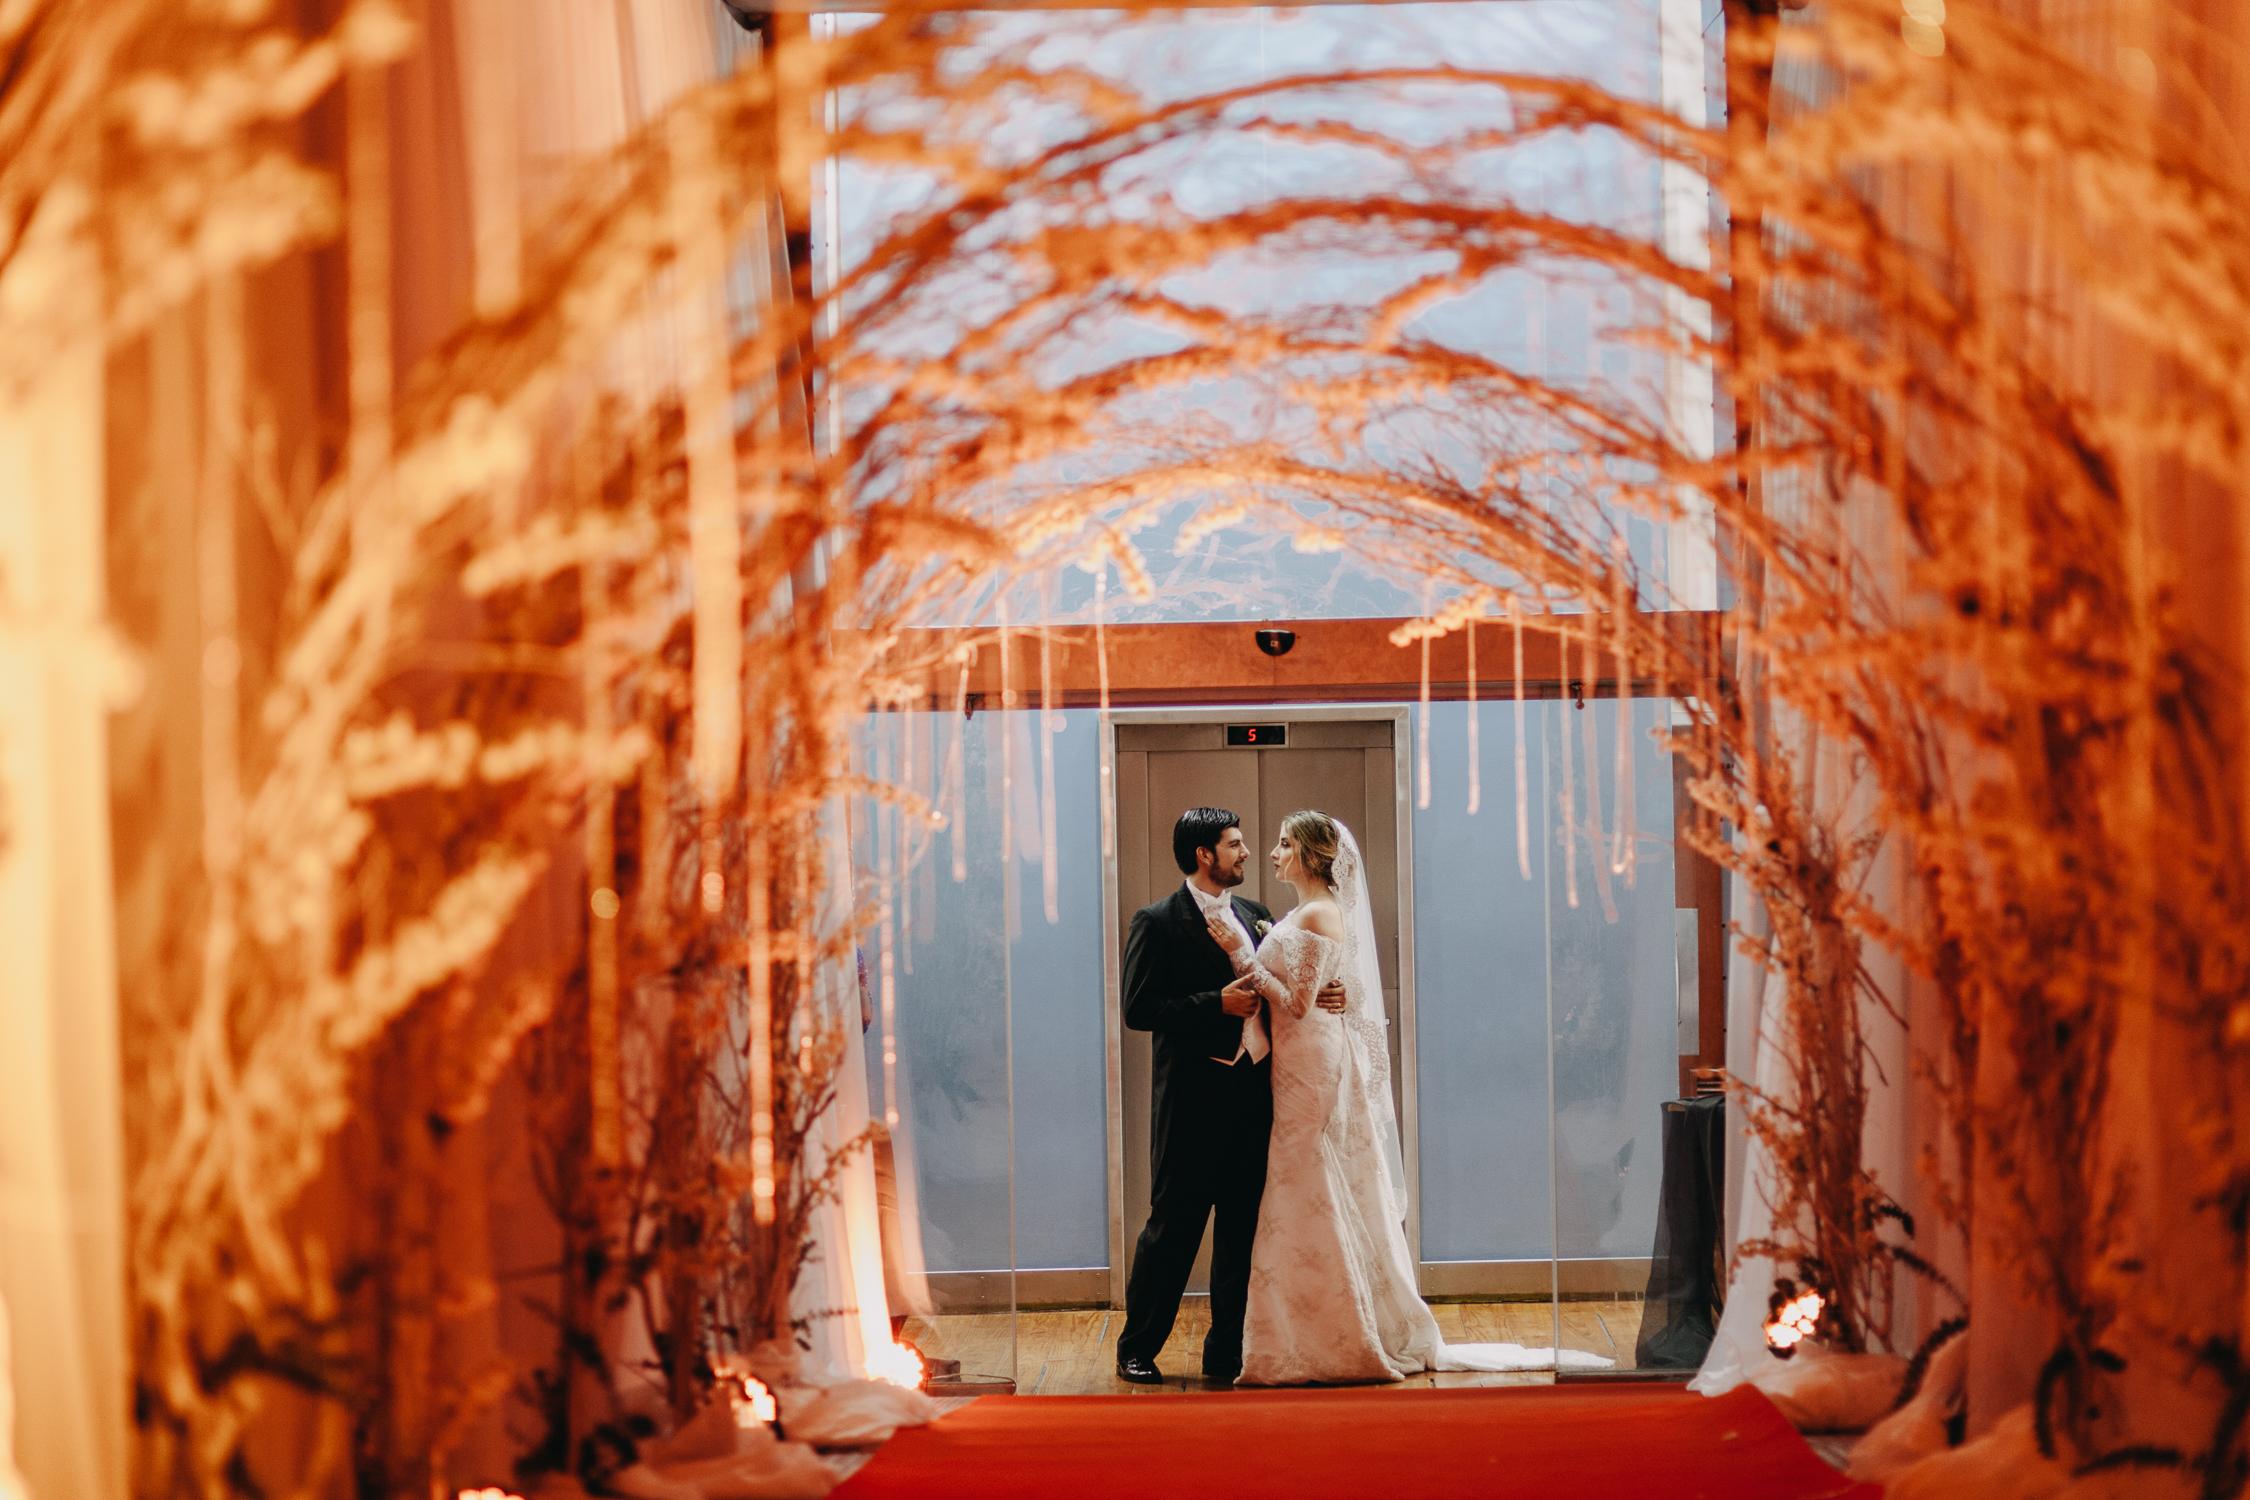 Michelle-Agurto-Fotografia-Bodas-Ecuador-Destination-Wedding-Photographer-Vicky-Javier-208.JPG